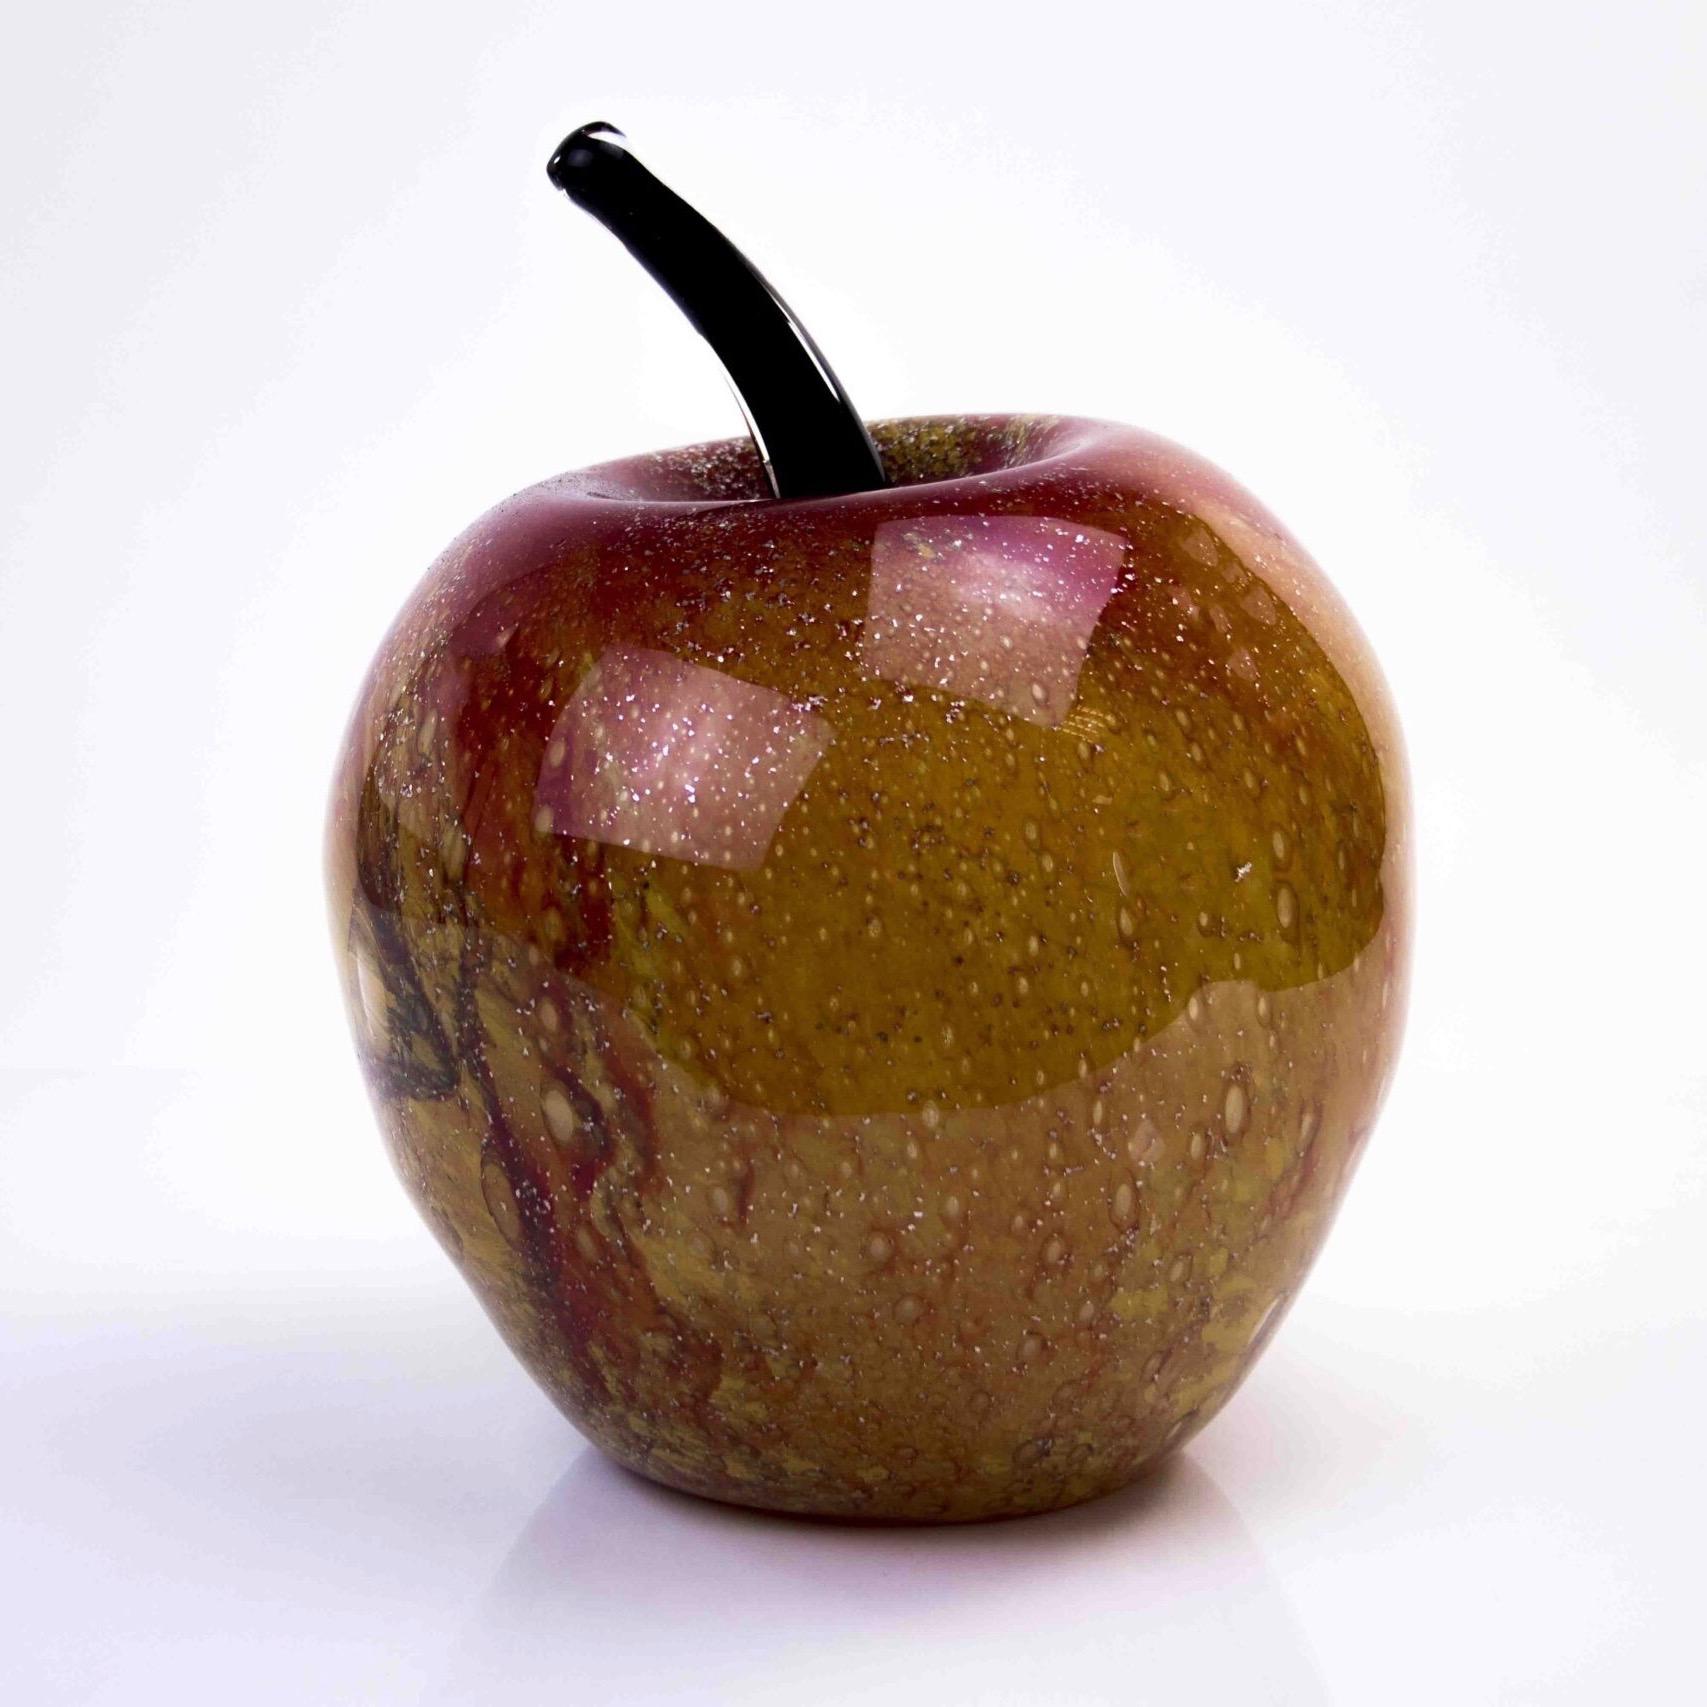 LoLoranto glazen 'Appel Rood'